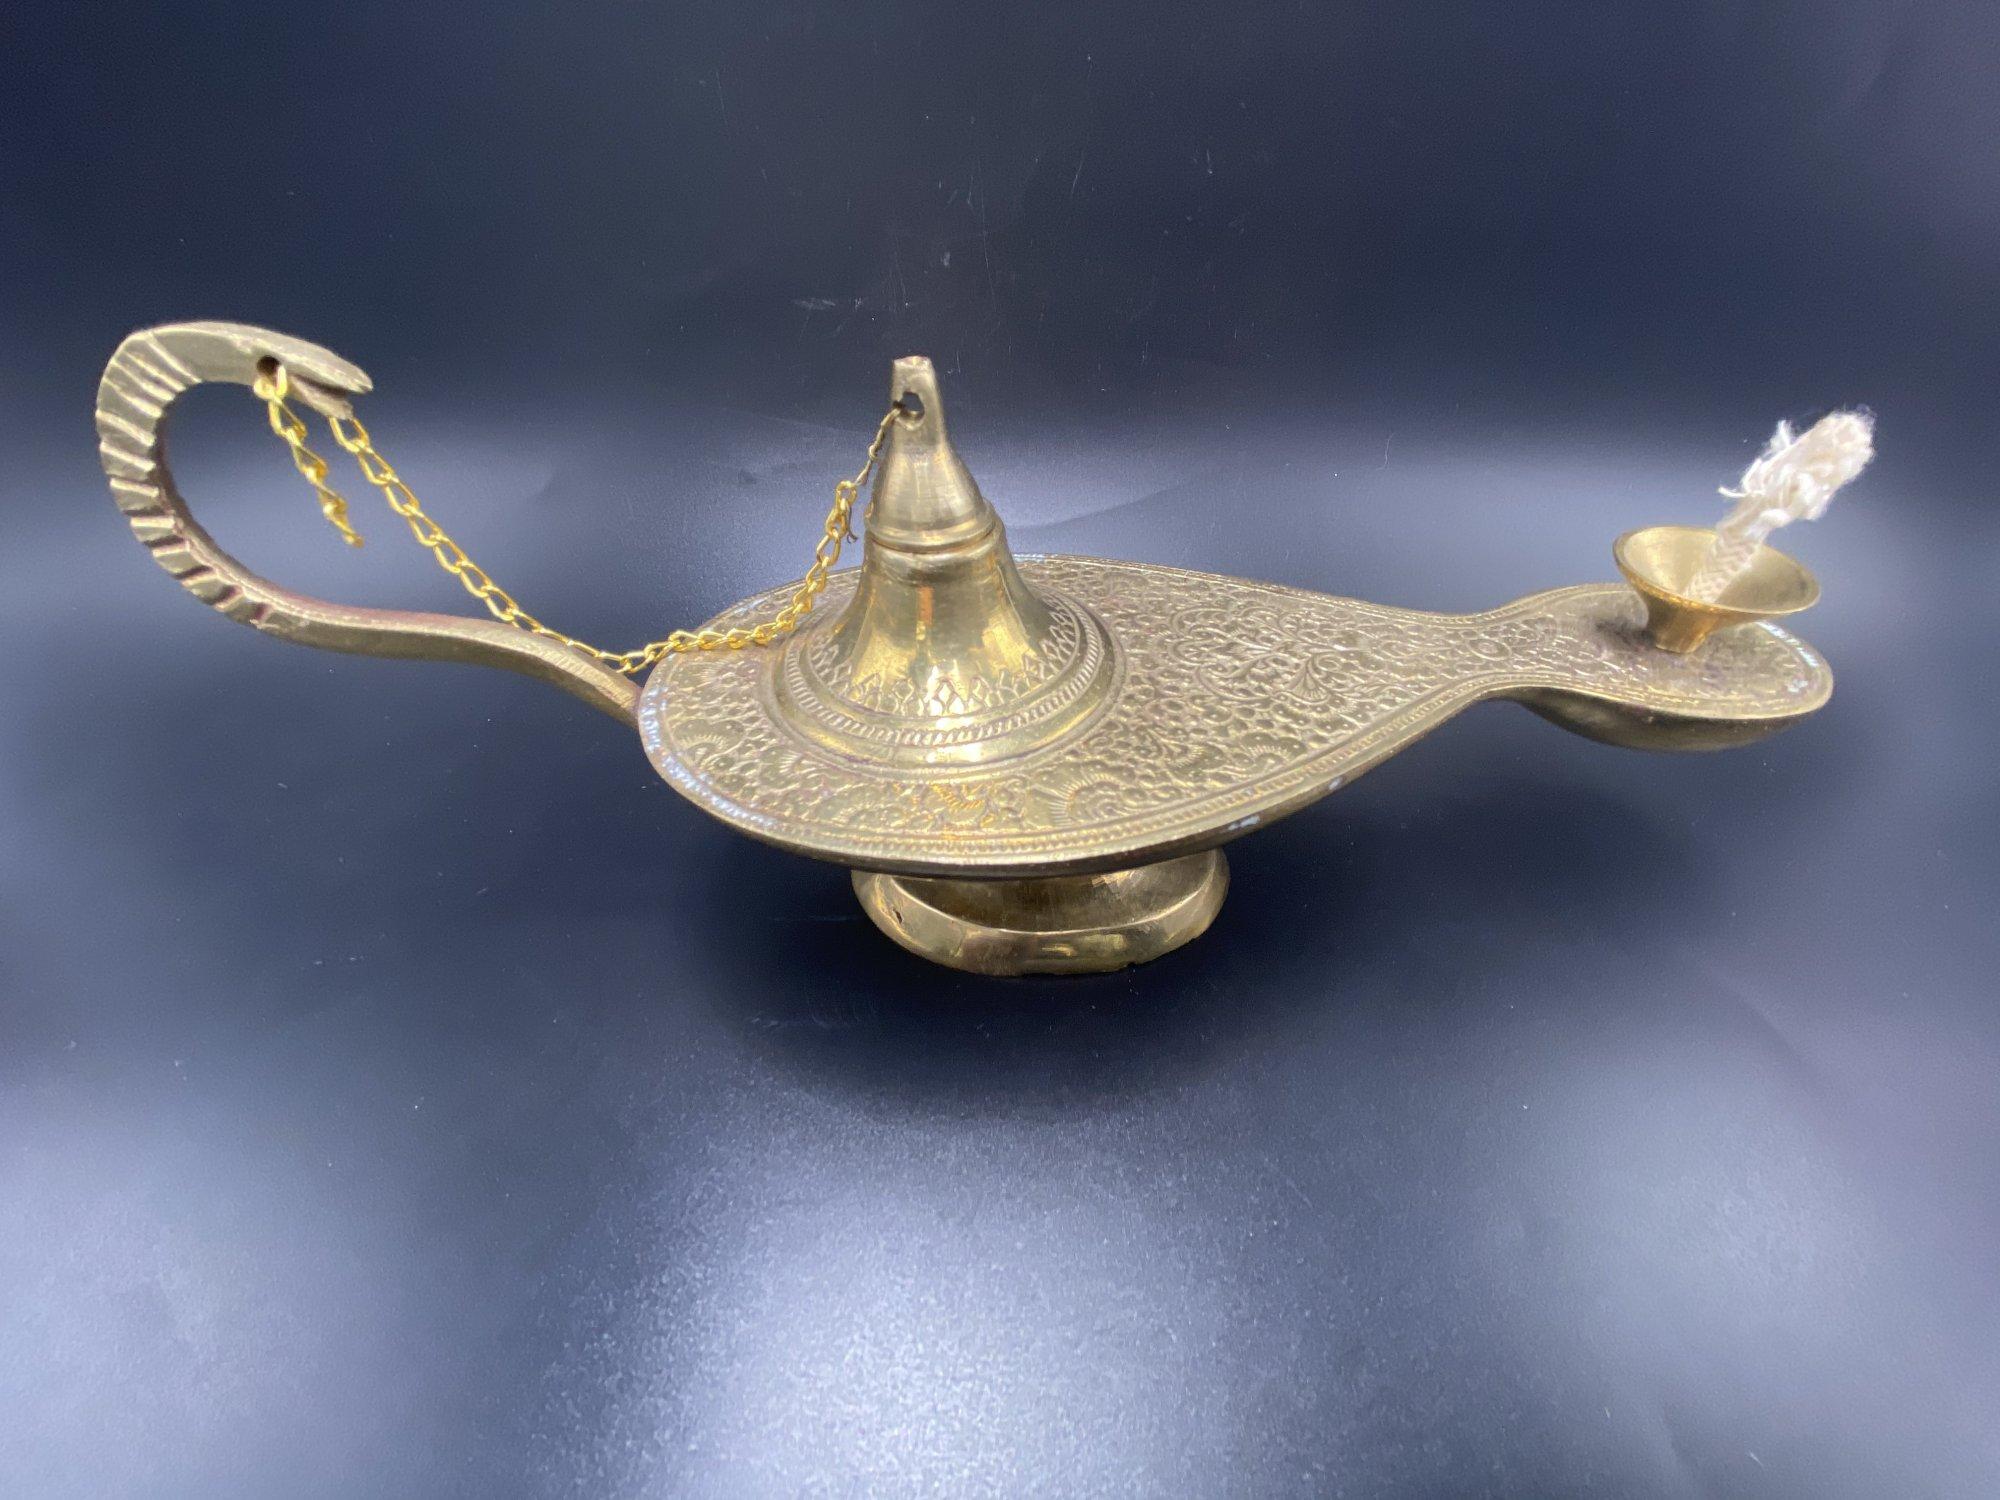 Brass persian oil lamp that looks like a Genie lamp  ST